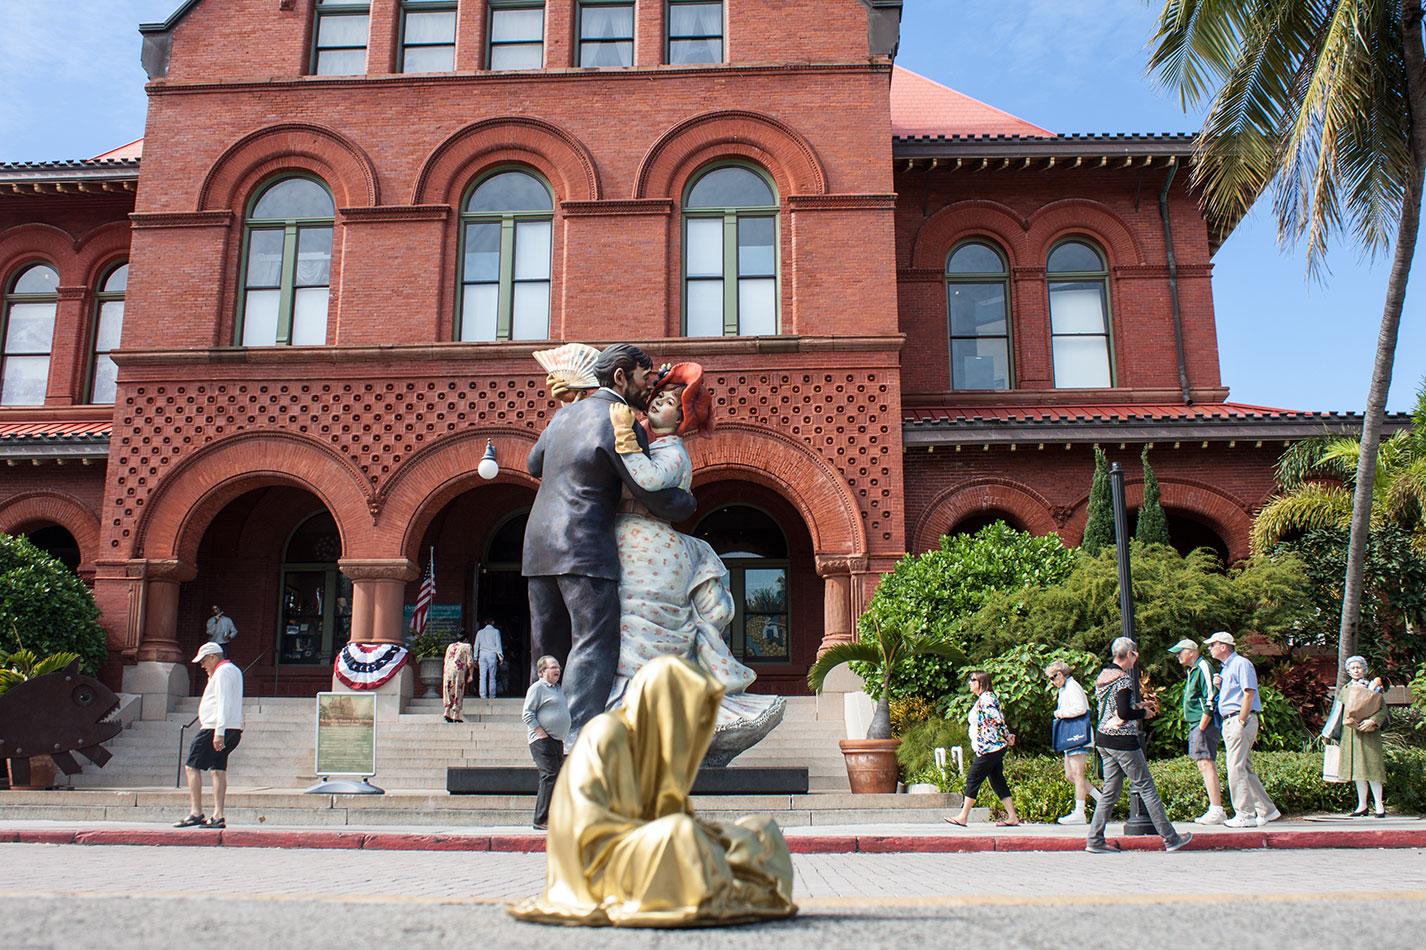 public-art-basel-miami-beach-fair-usa-florida-guardians-of-time-manfred-kili-kielnhofer-contemporary-fine-art-modern-arts-design-antiques-sculpture-6752